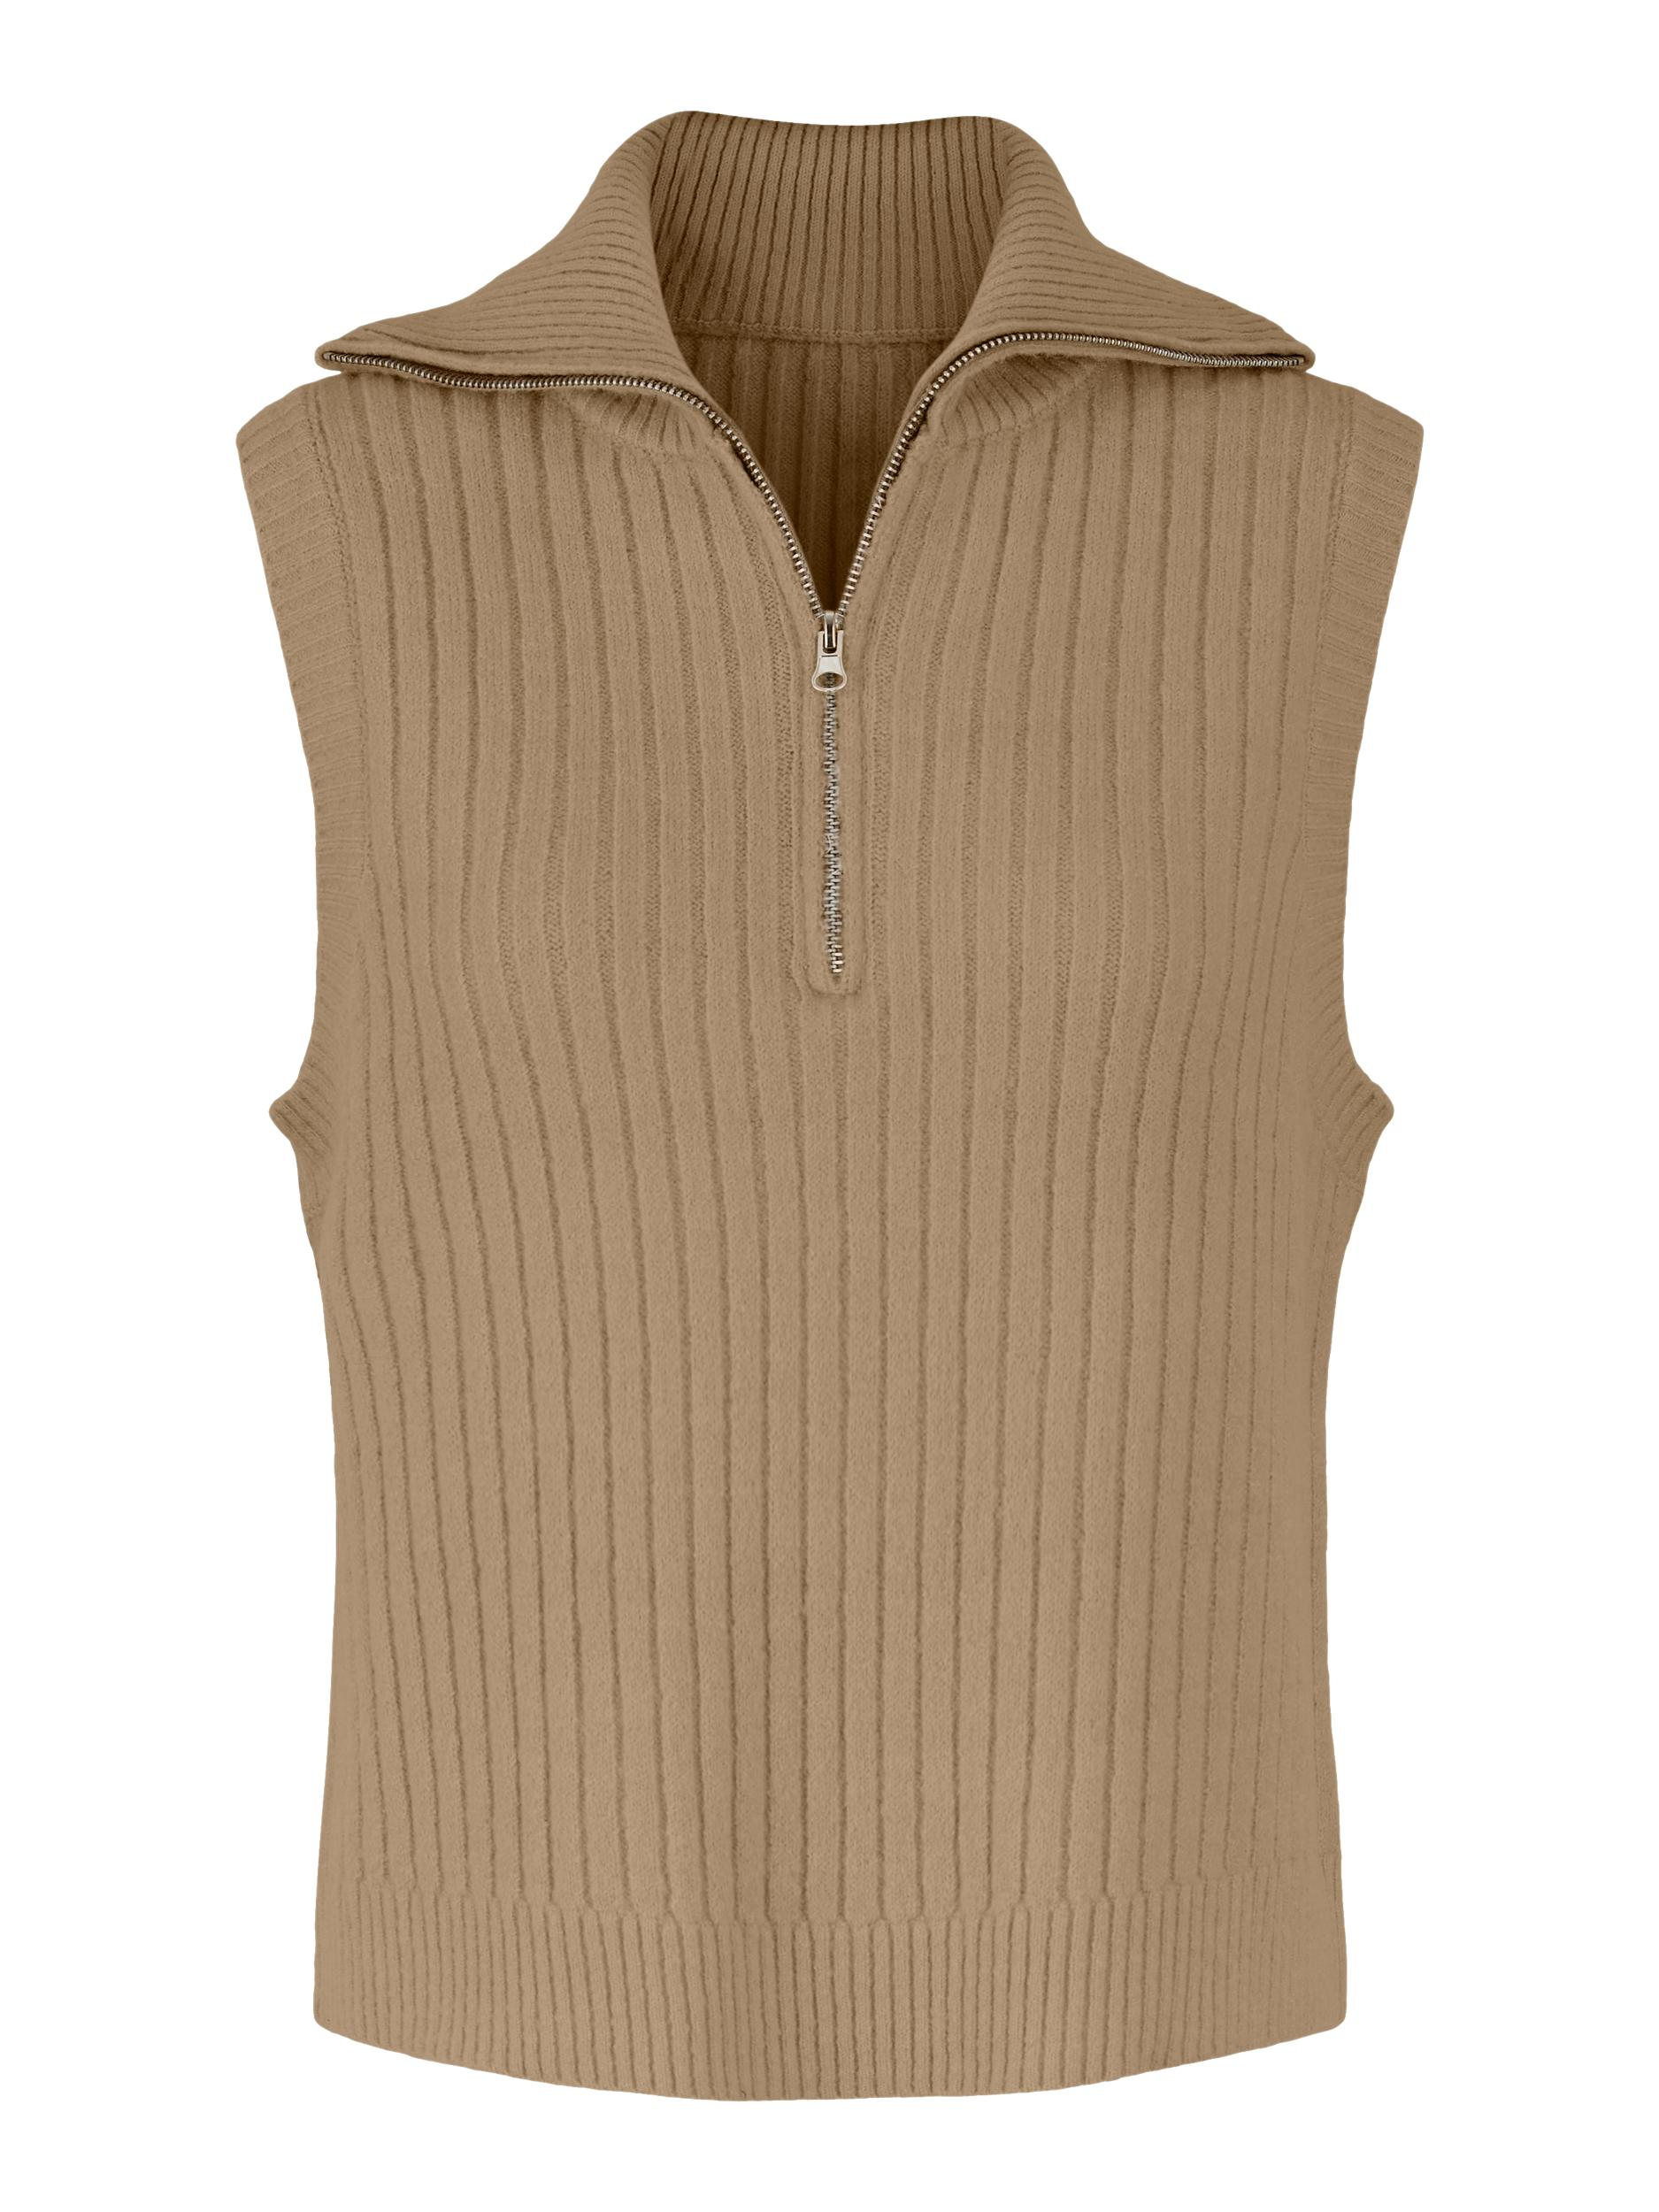 Pieces Angi knit vest, tannin, x-large